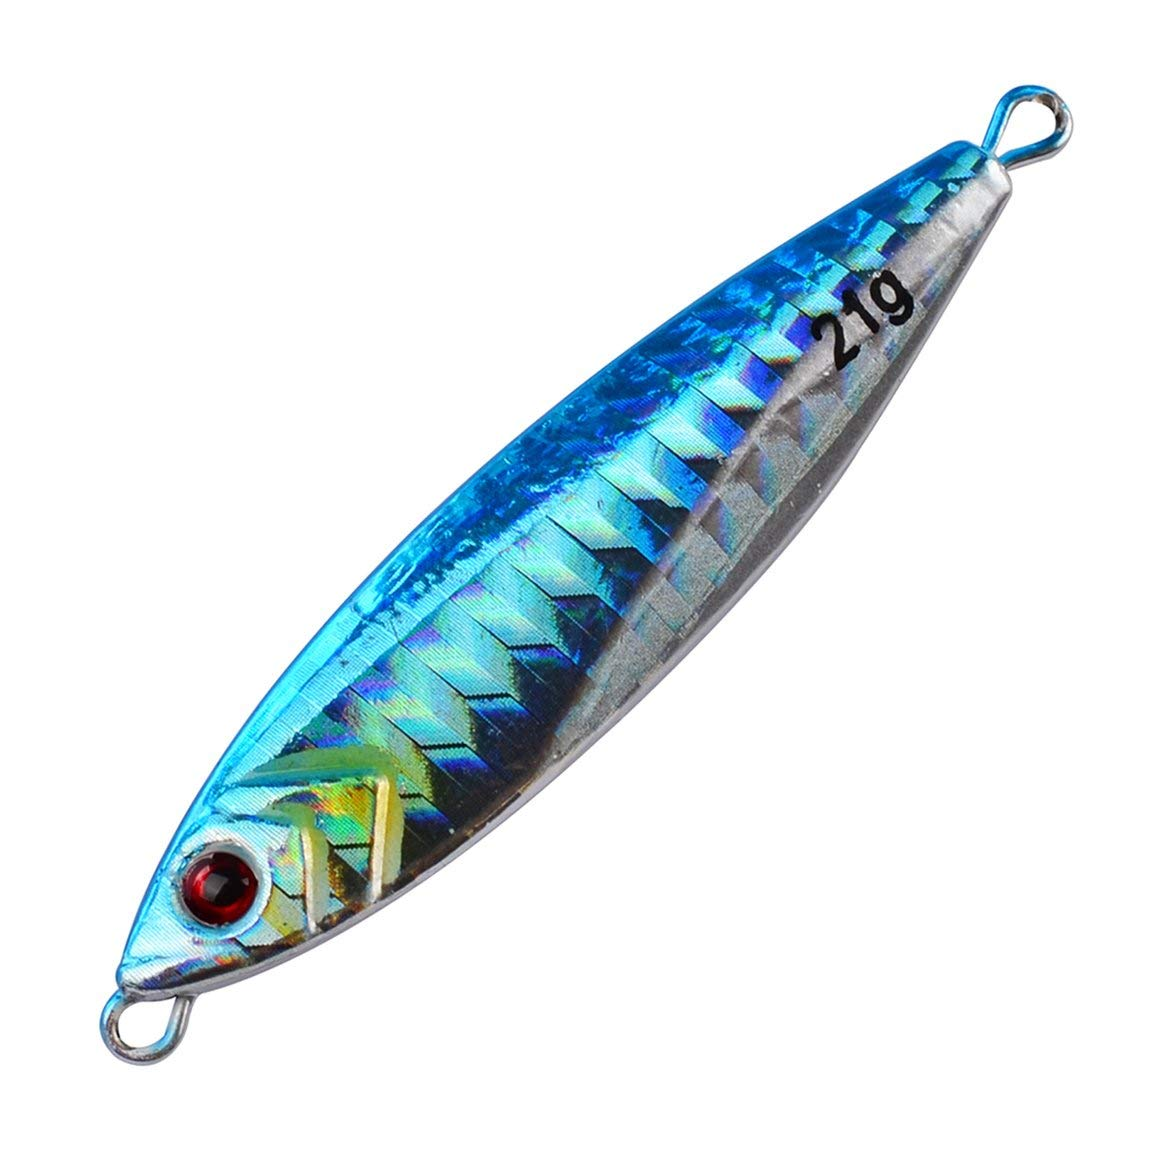 Garciasia 6,5 cm 21 g de Metal de Pesca se/ñuelos peque/ño 3D Realista Pesca Cebo Duro Artificial